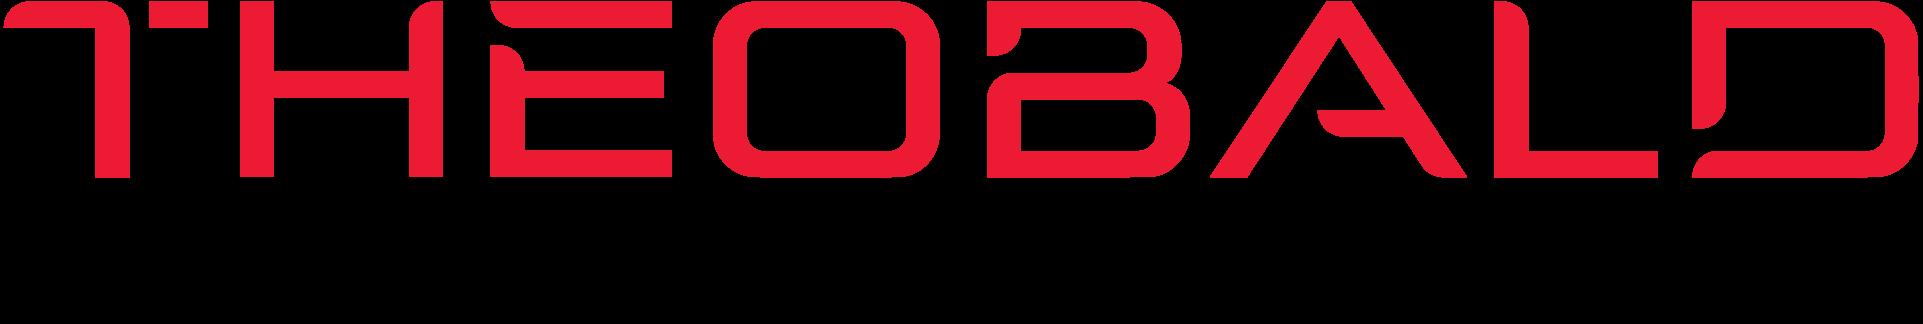 Board Technology partner: Theobald - SAP data integration